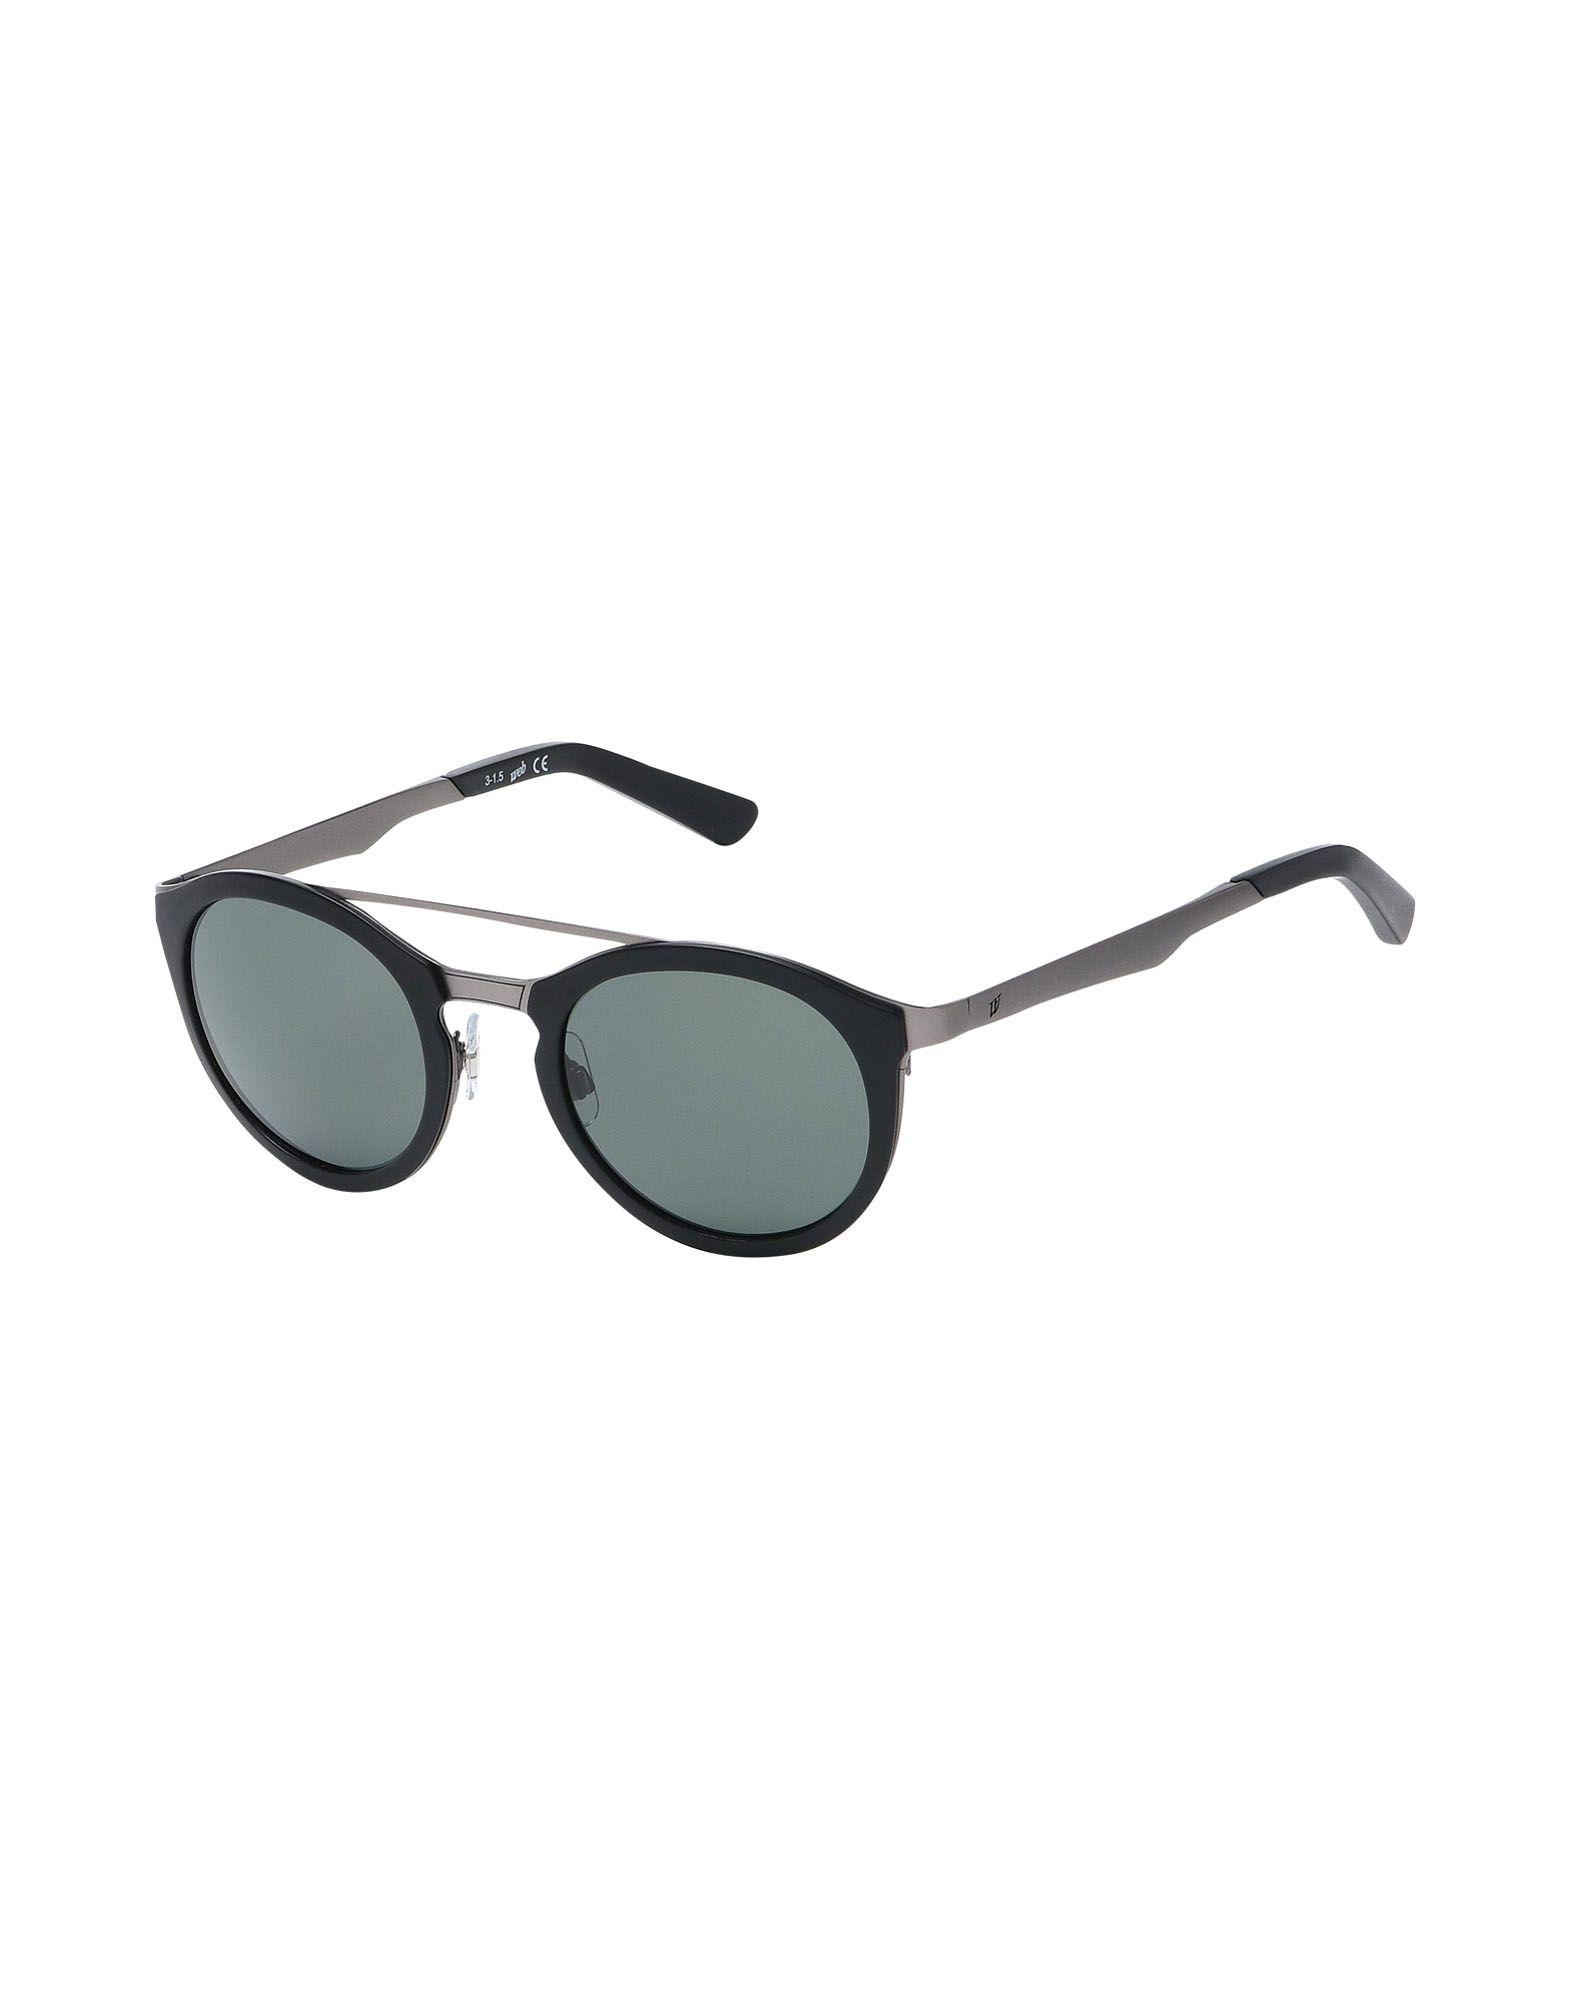 Occhiali Da Sole Web Eyewear Uomo - Acquista online su